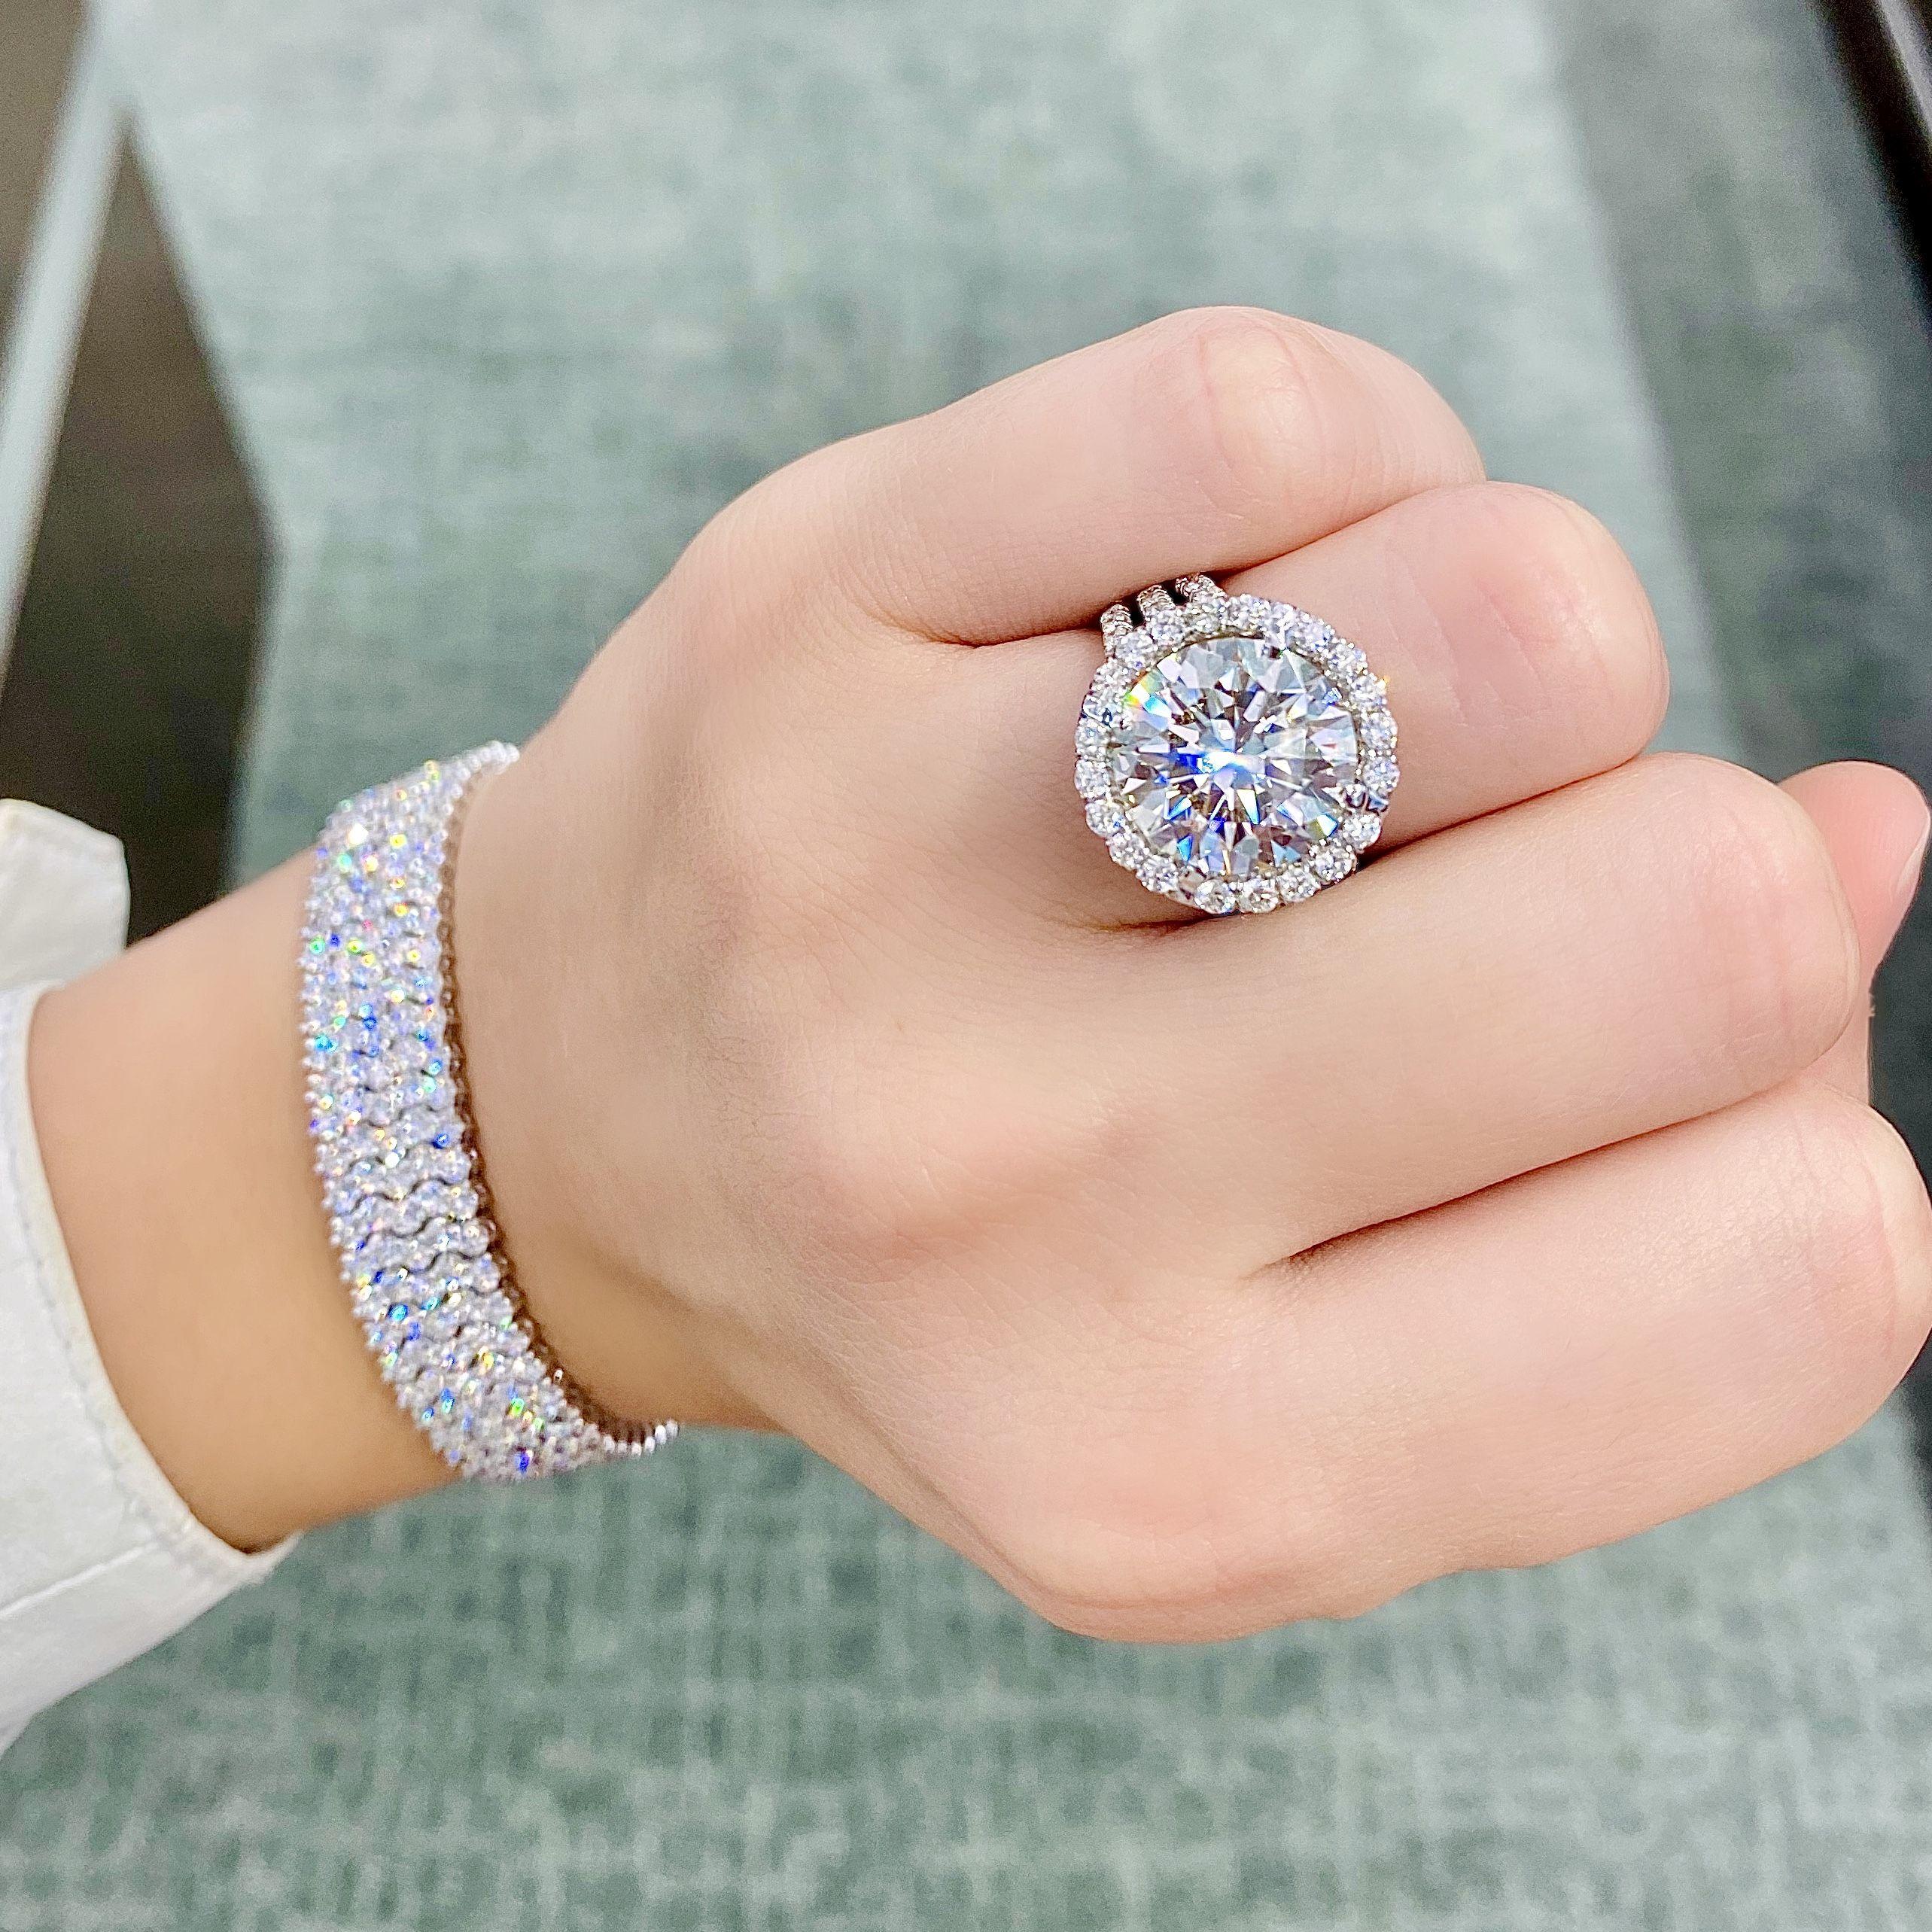 10 Carat Round Diamond Engagement Ring With Diamond Halo In 2020 Round Diamond Engagement Rings Diamond Diamond Engagement